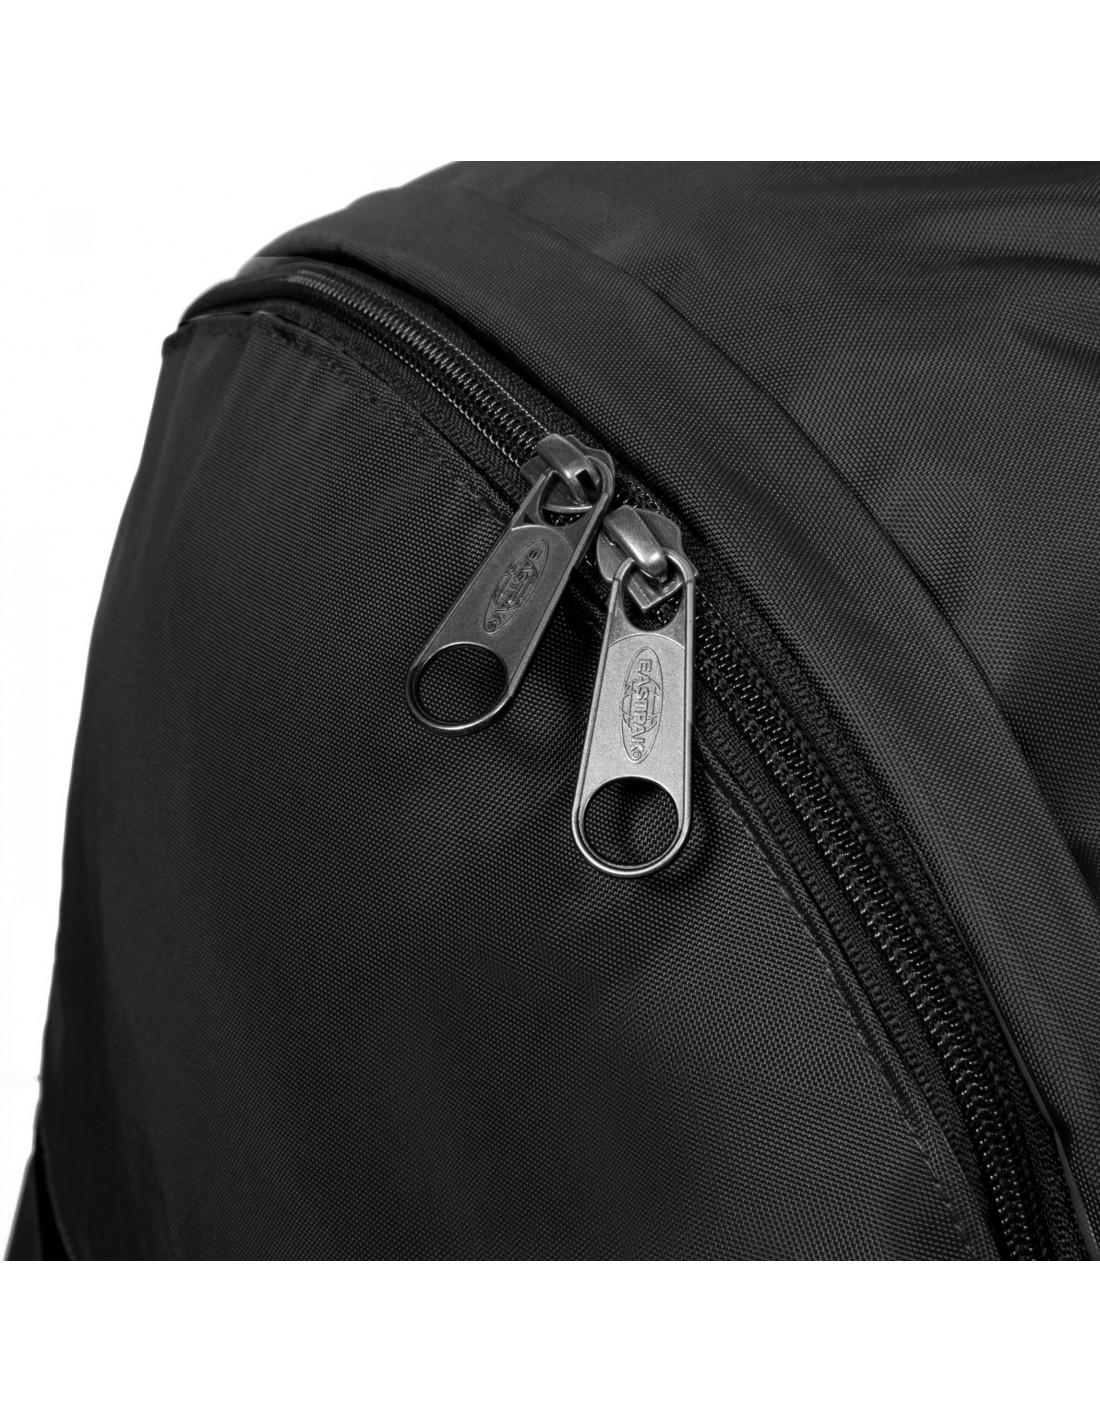 hete verkoop wereldwijd verkocht online winkel Eastpak Padded Instant Rugzak Opvouwbaar Black